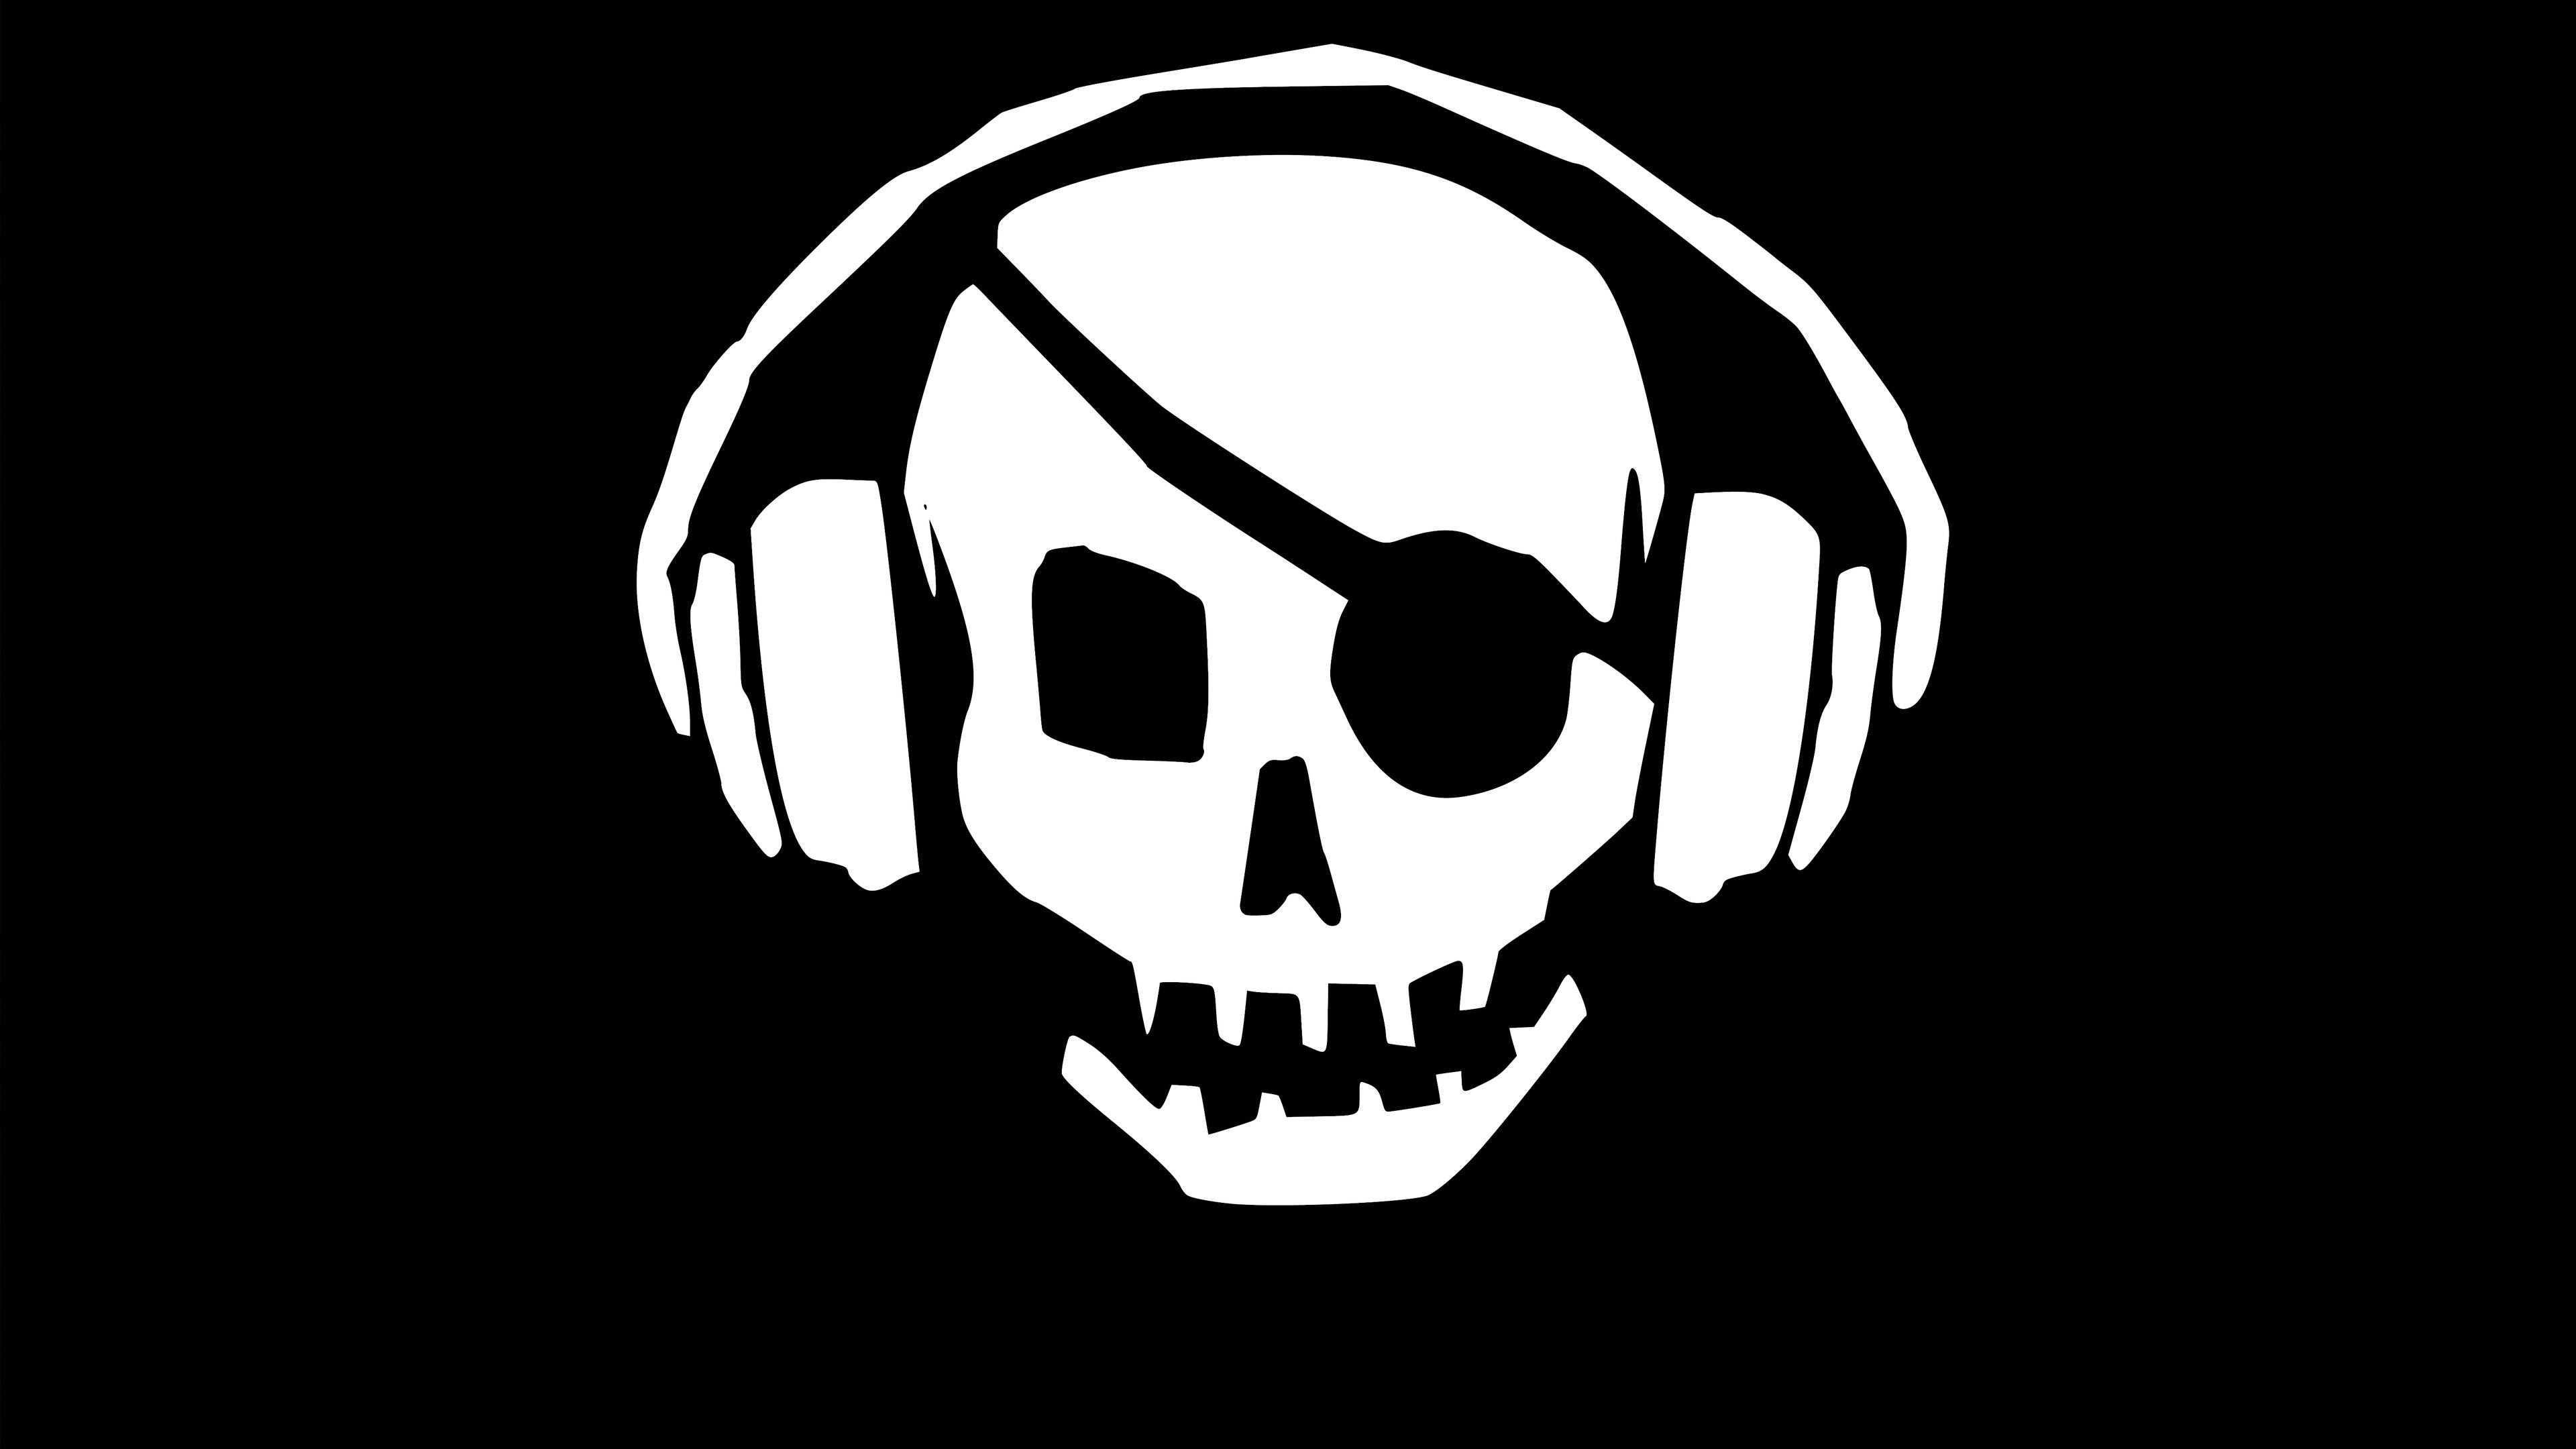 pirate skull headphones 4k 1551642335 - Pirate Skull Headphones 4k - skull wallpapers, pirate wallpapers, headphones wallpapers, hd-wallpapers, 4k-wallpapers